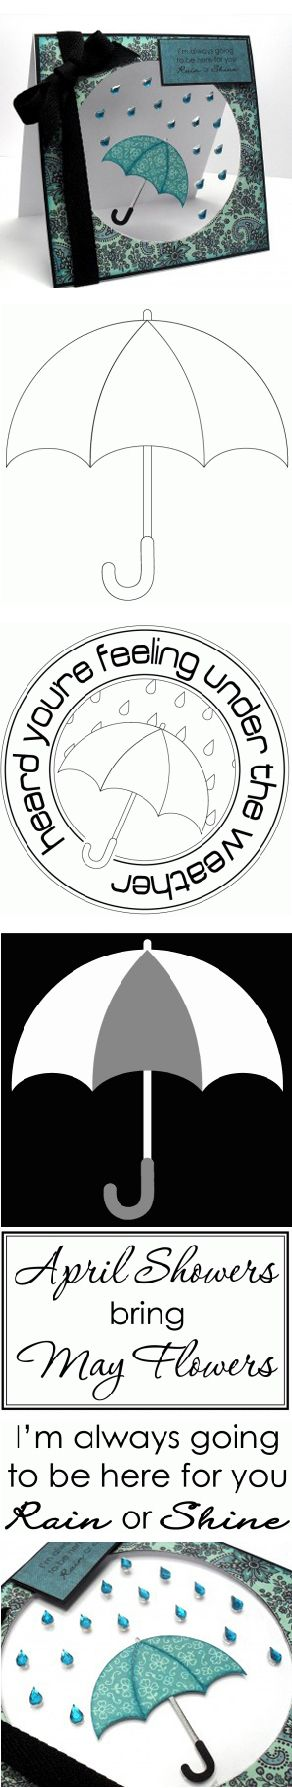 rain or shine umbrella -- free digital set (with cut files) from Birds Cards -- http://www.birdscards.com/?p=2288